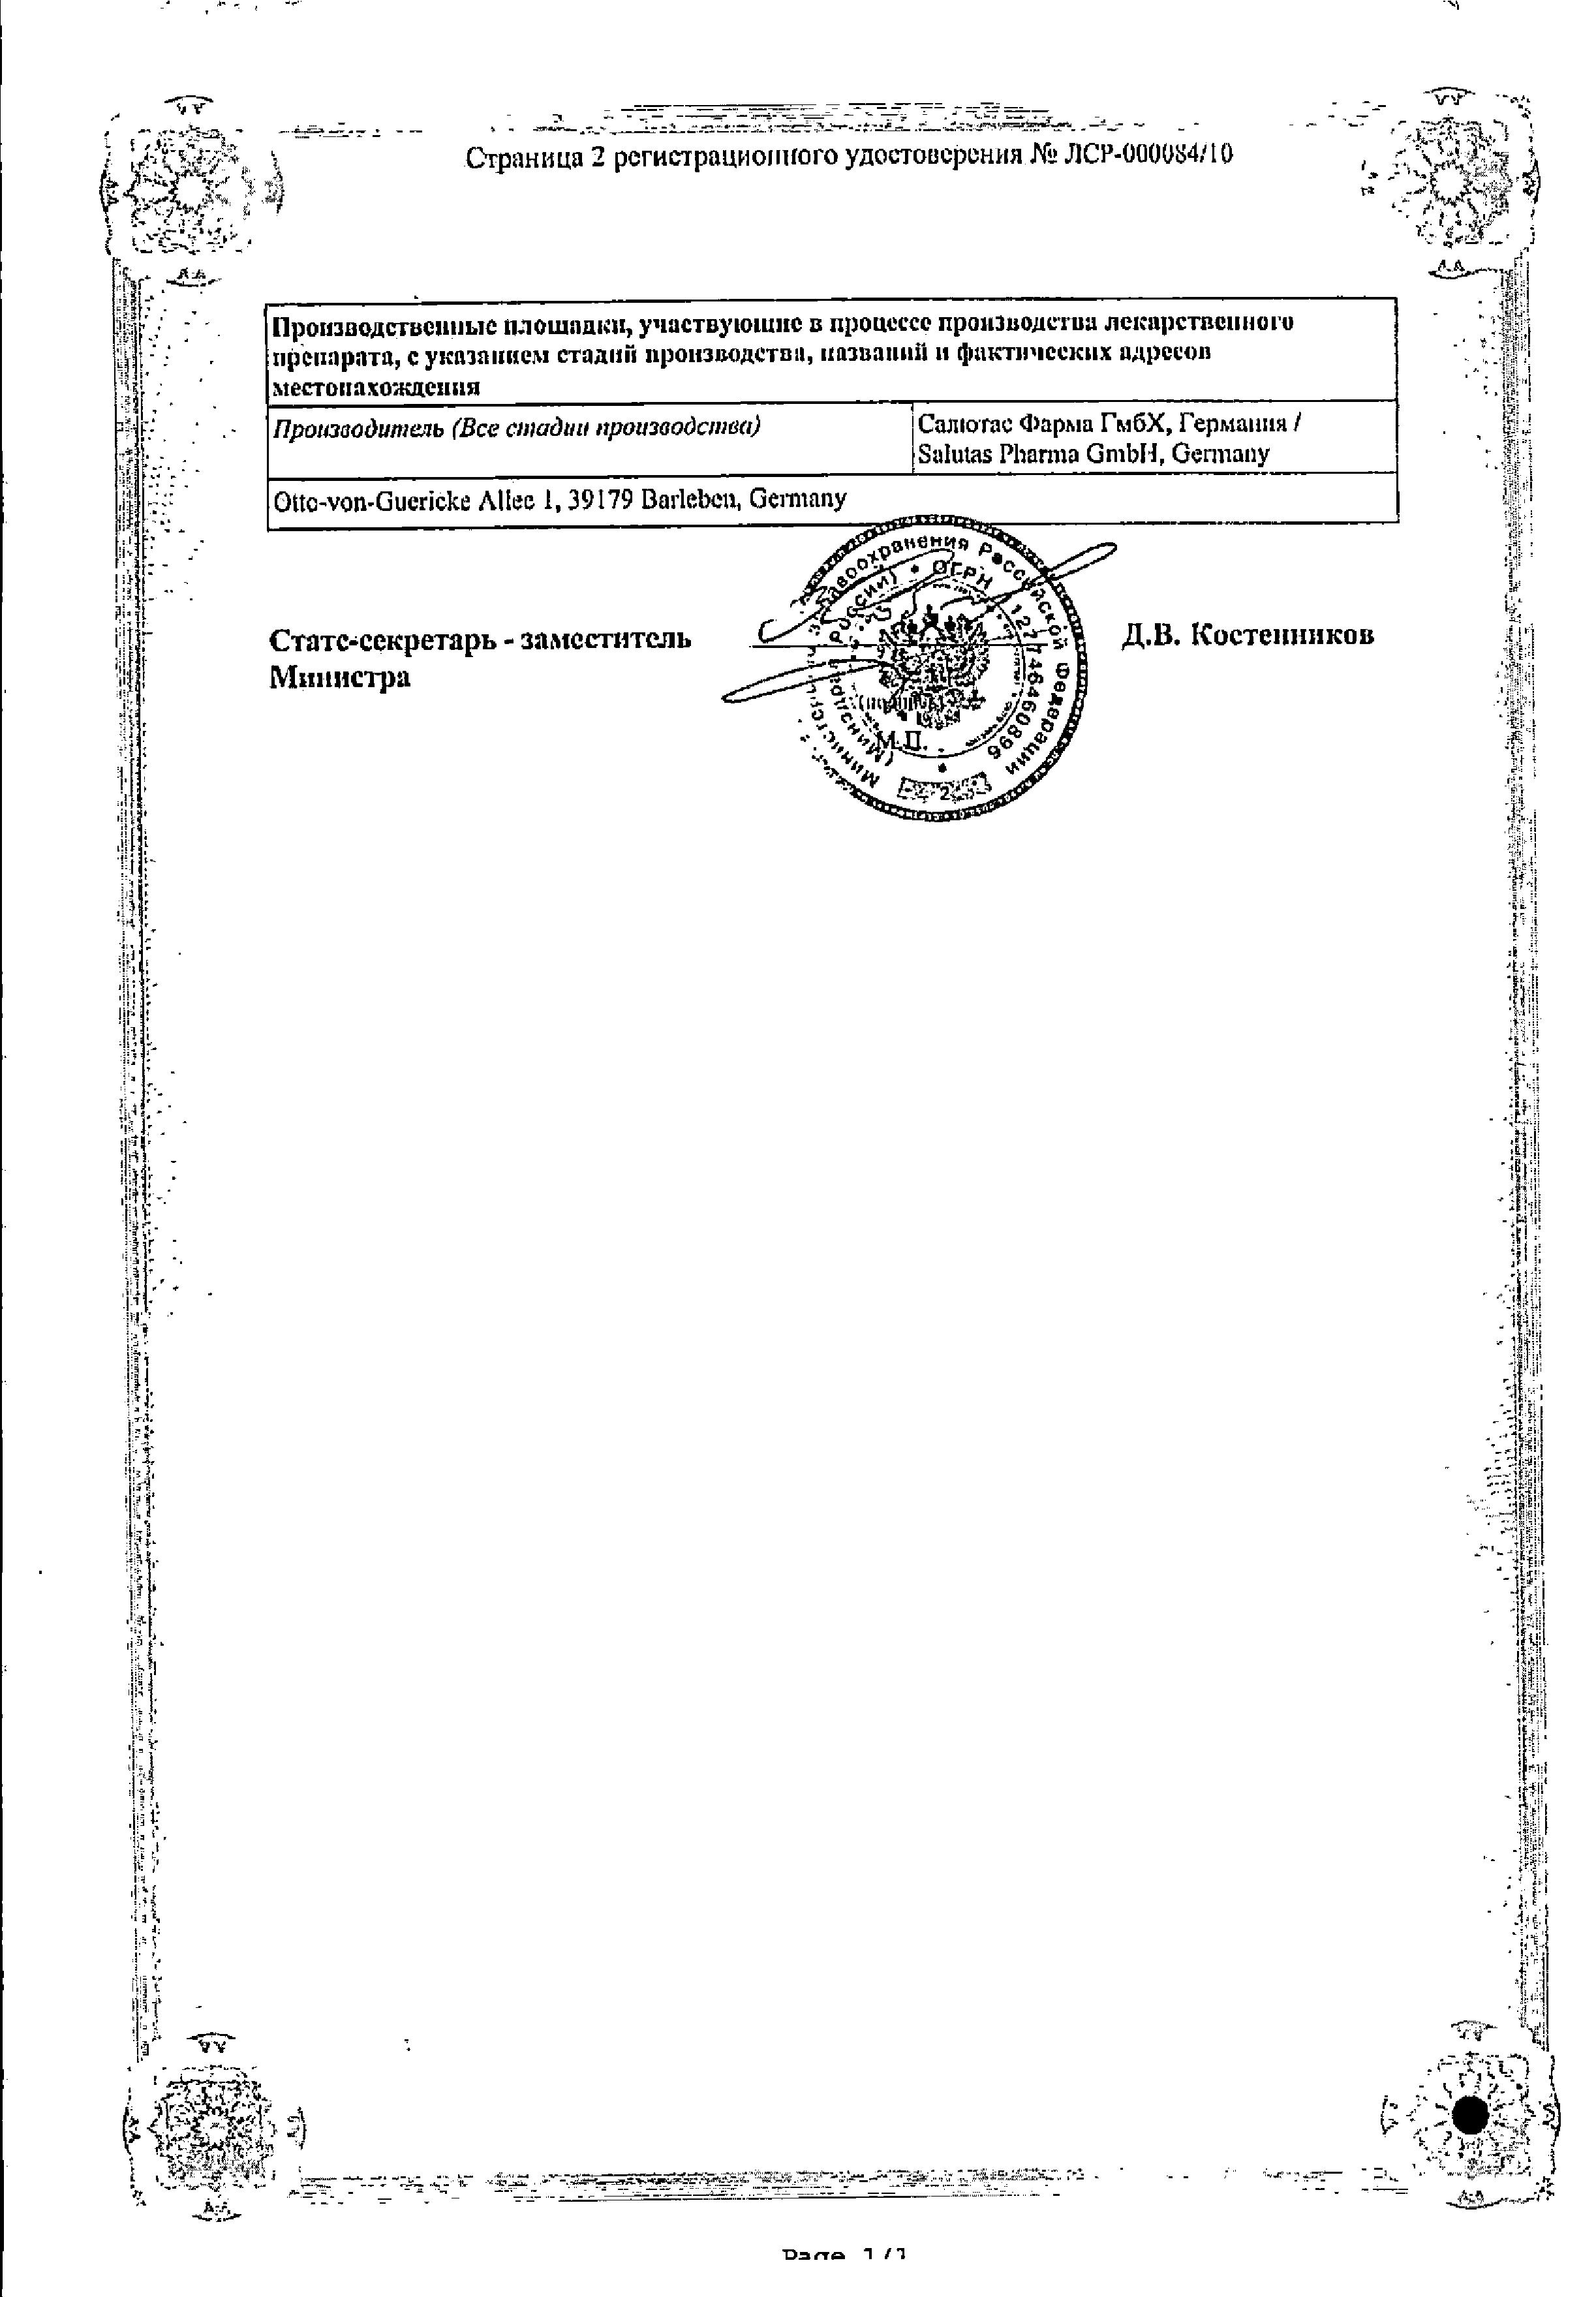 Моксонитекс сертификат